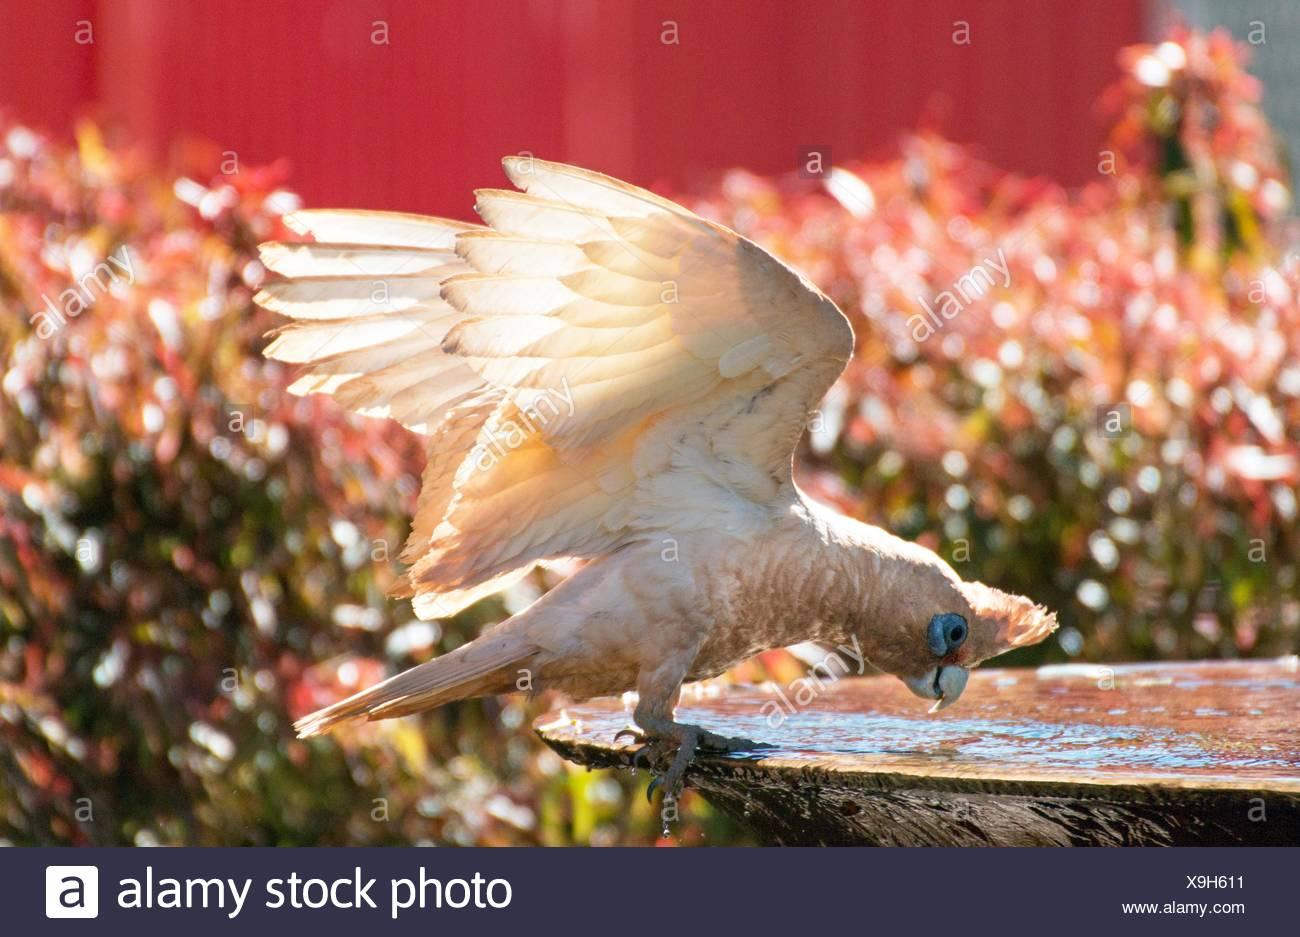 bare-eyed cockatoo - Stock Image